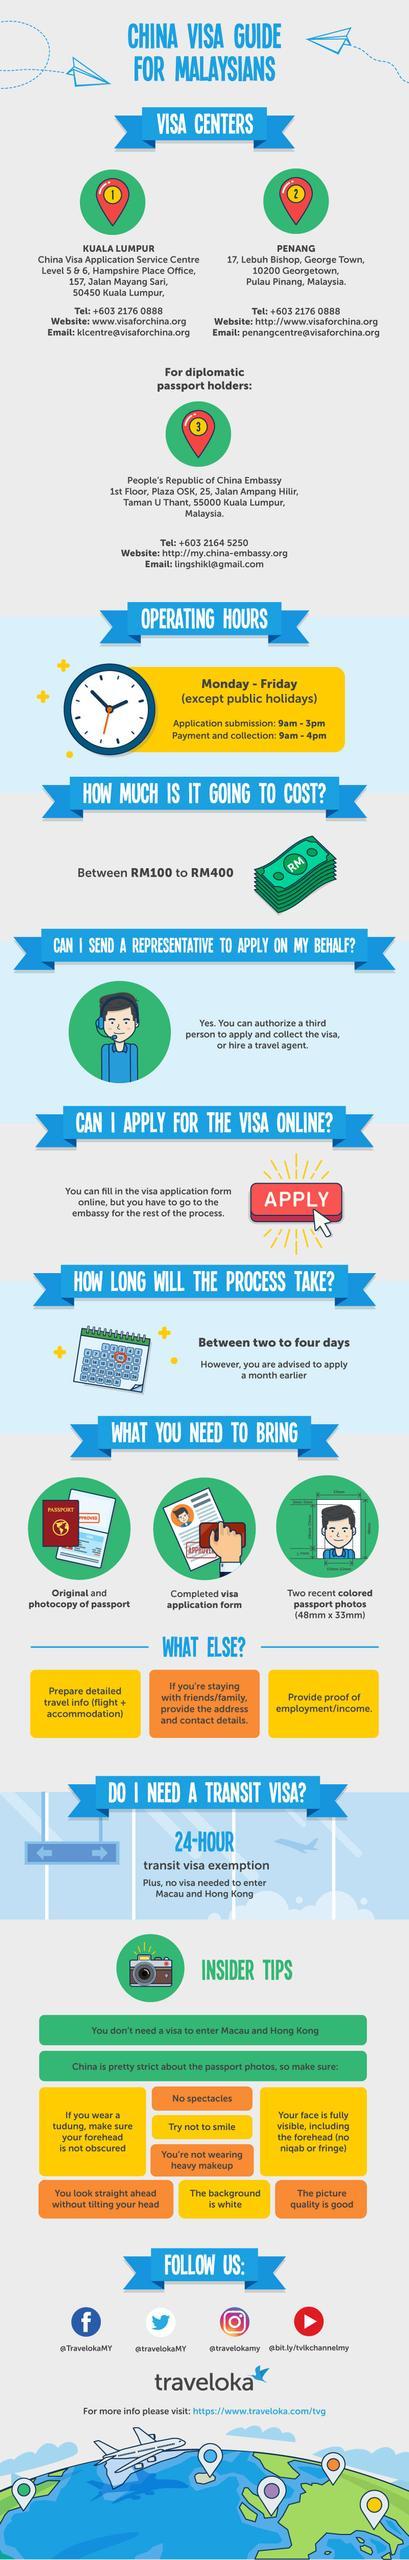 Travel China Visa Guide For Malaysians 2020 Traveloka My